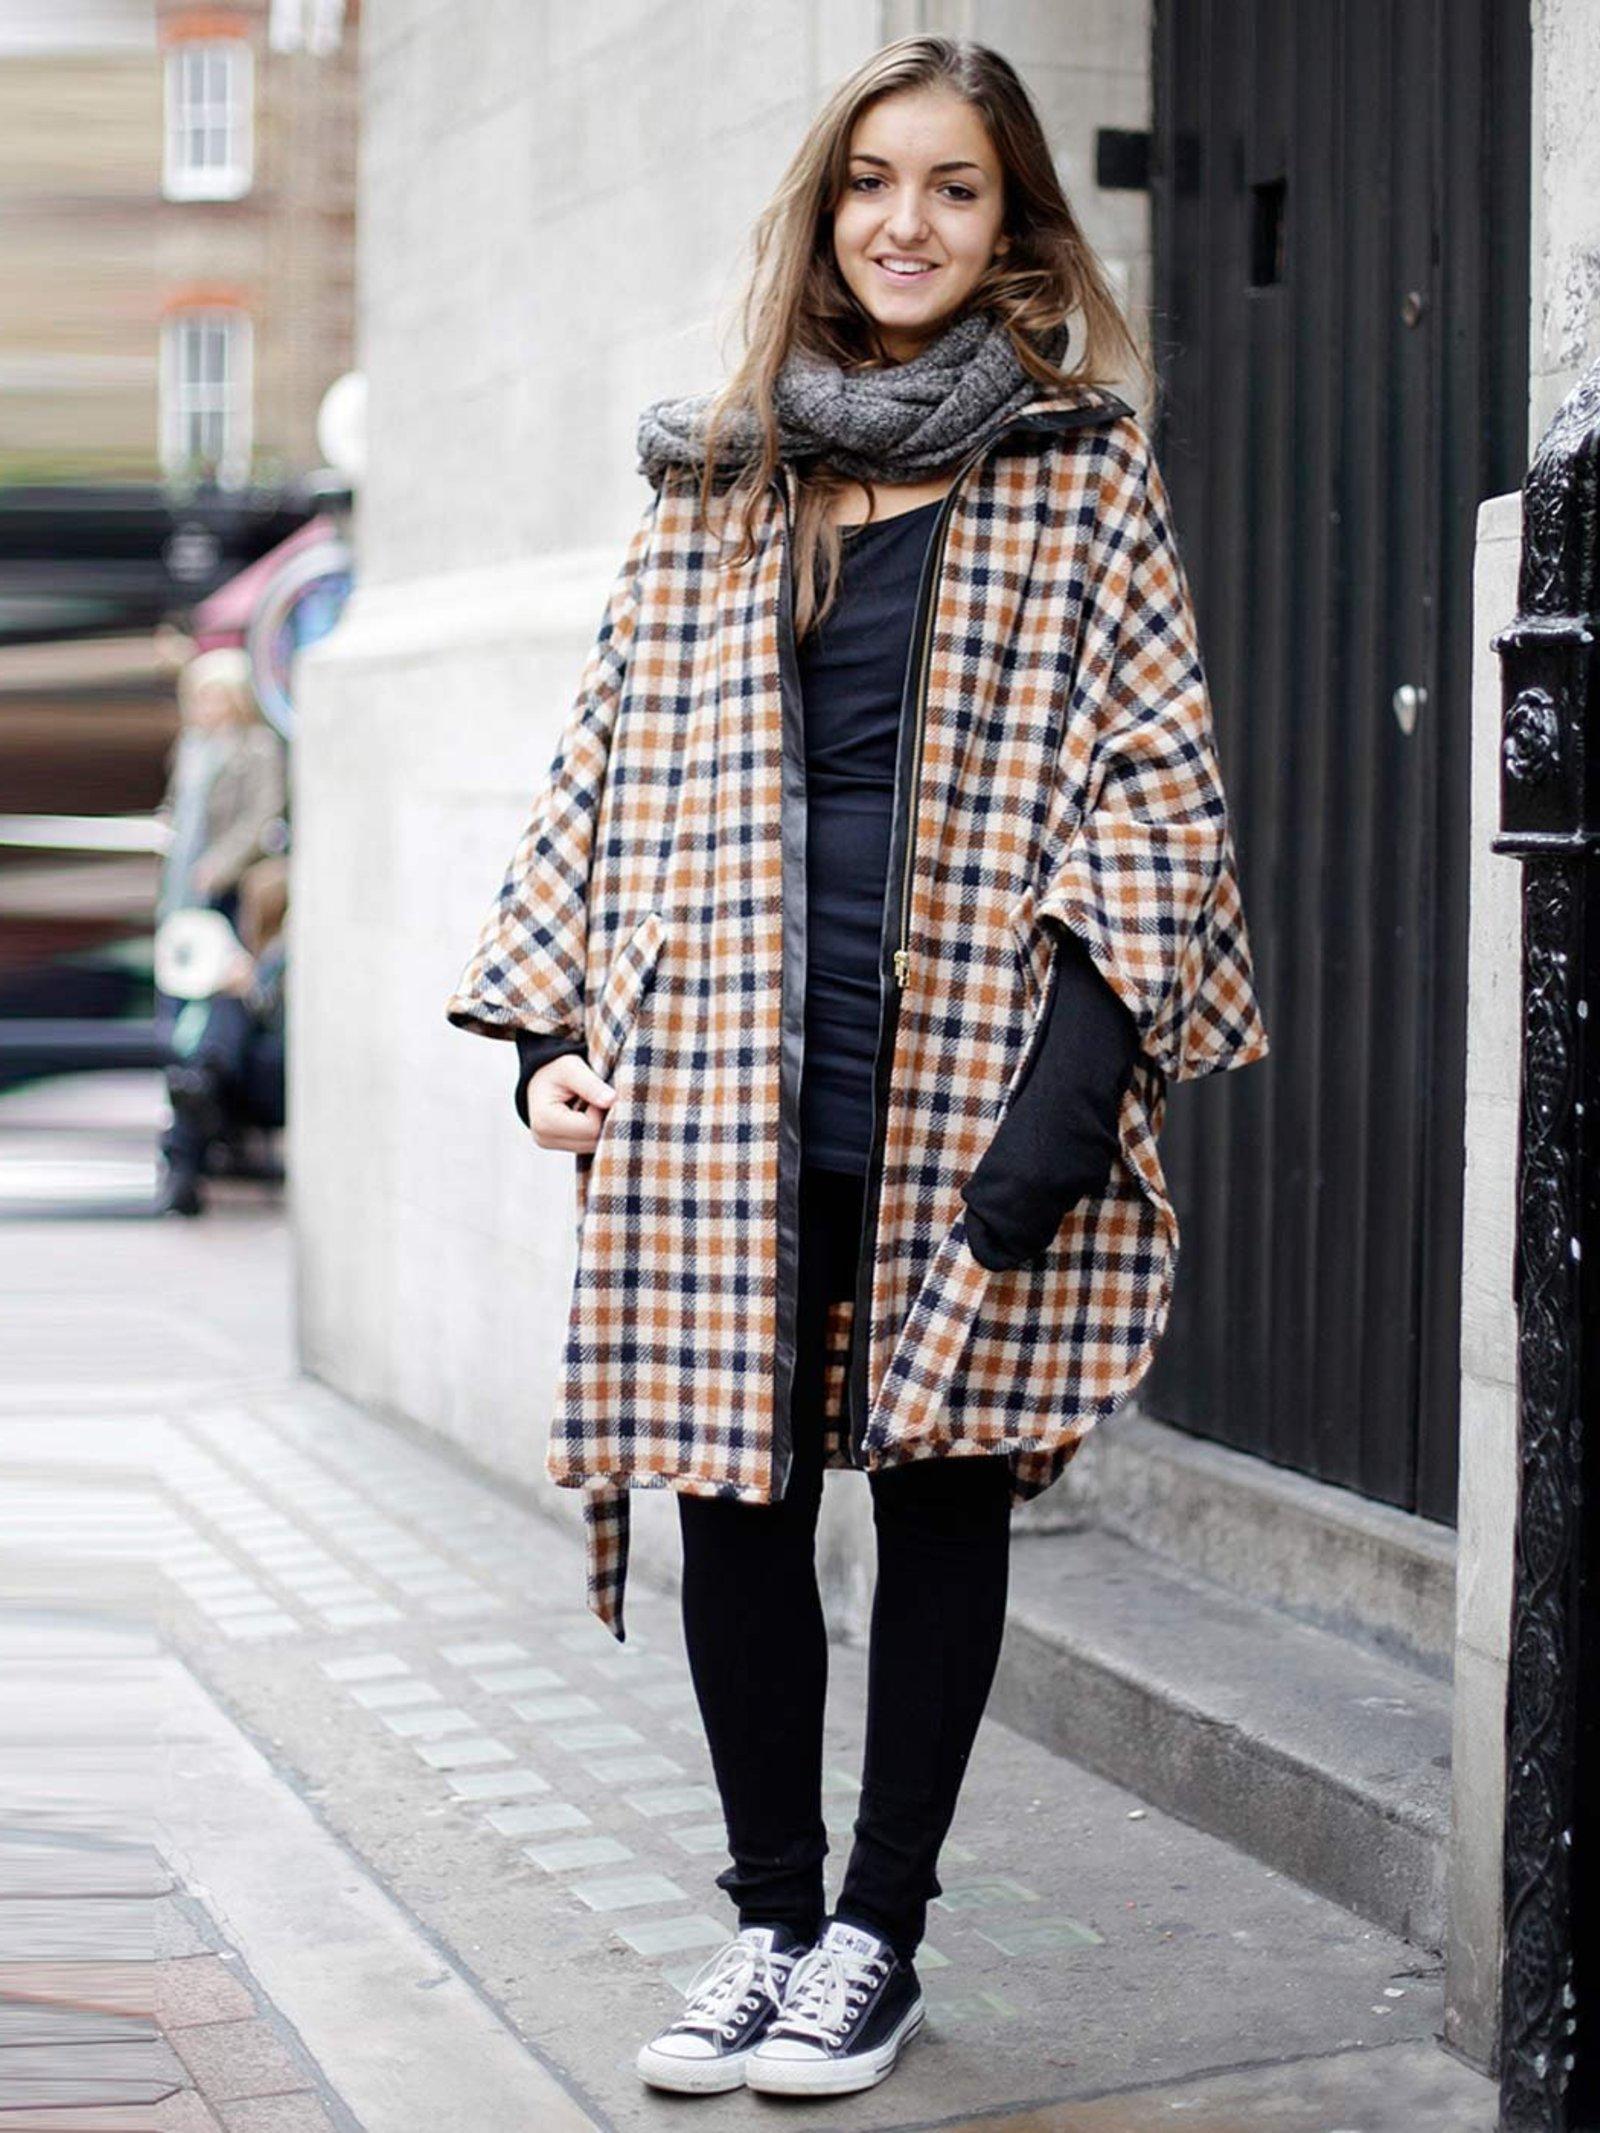 winter coats #1: 1600x2133 1f64cf097c1 assets elleuk gallery 22 street style winter coats silvia olsen